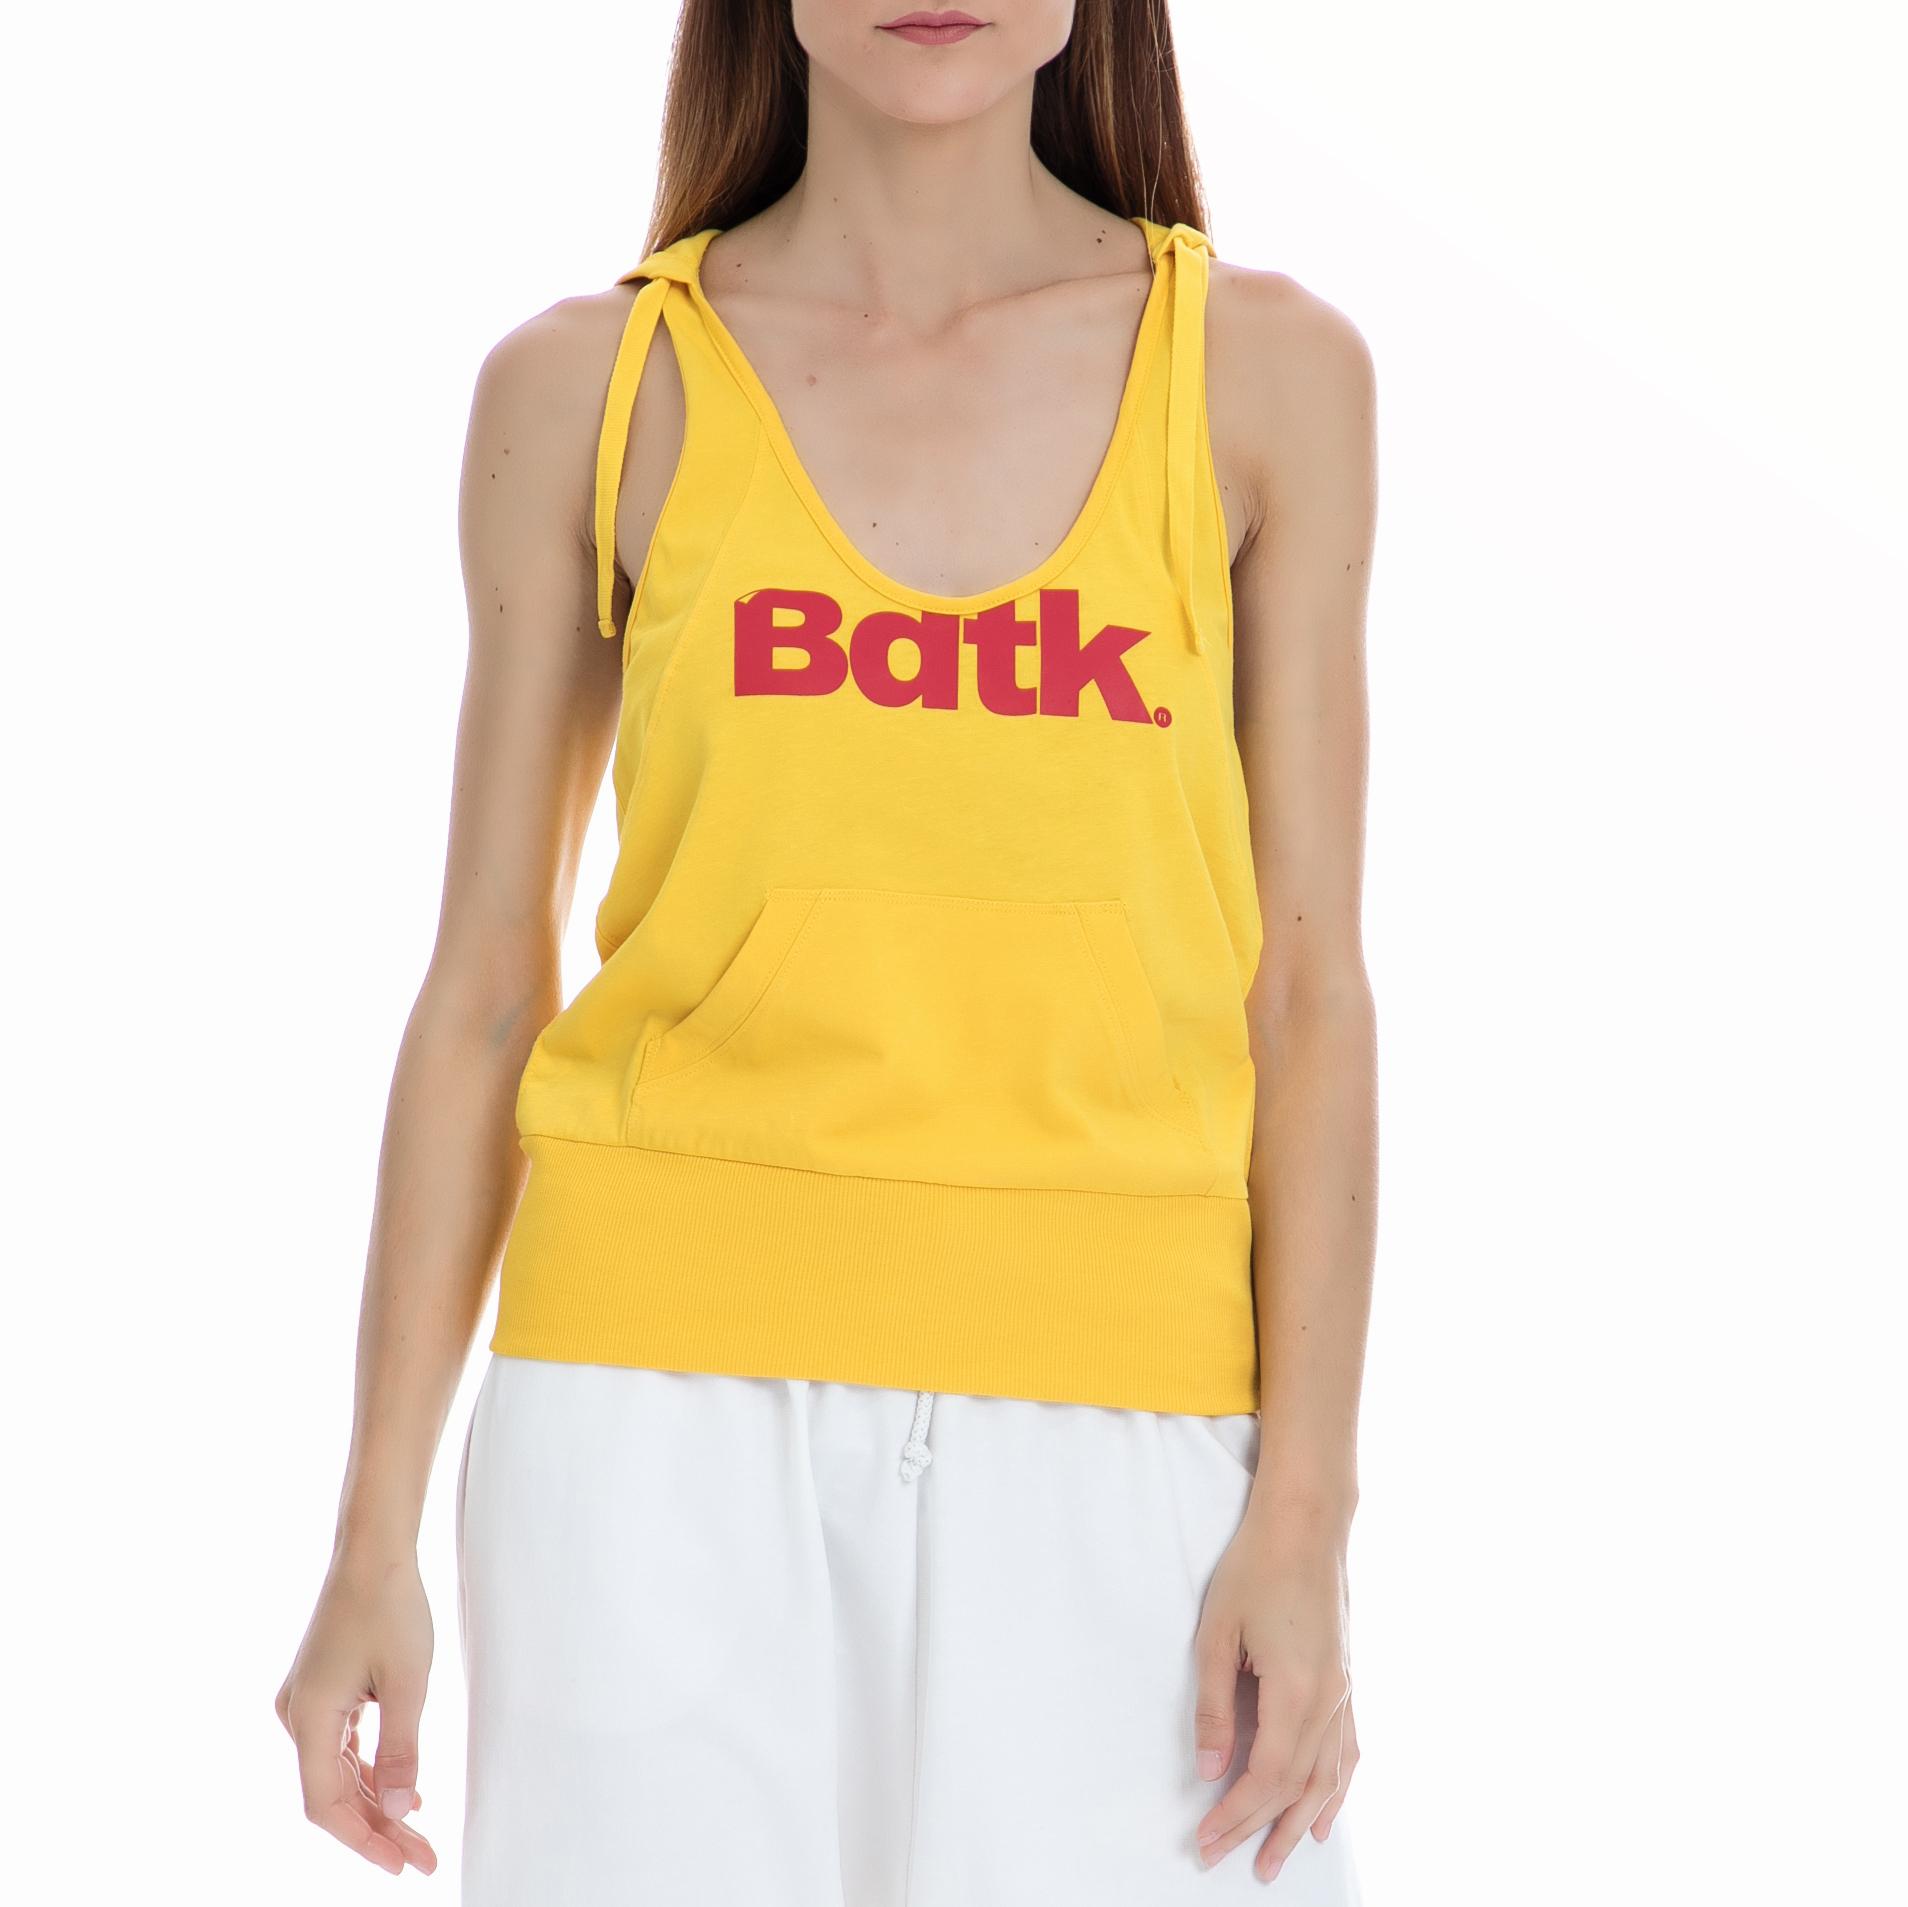 BODYTALK - Γυναικεία μπλούζα BODYTALK κίτρινη γυναικεία ρούχα αθλητικά t shirt τοπ